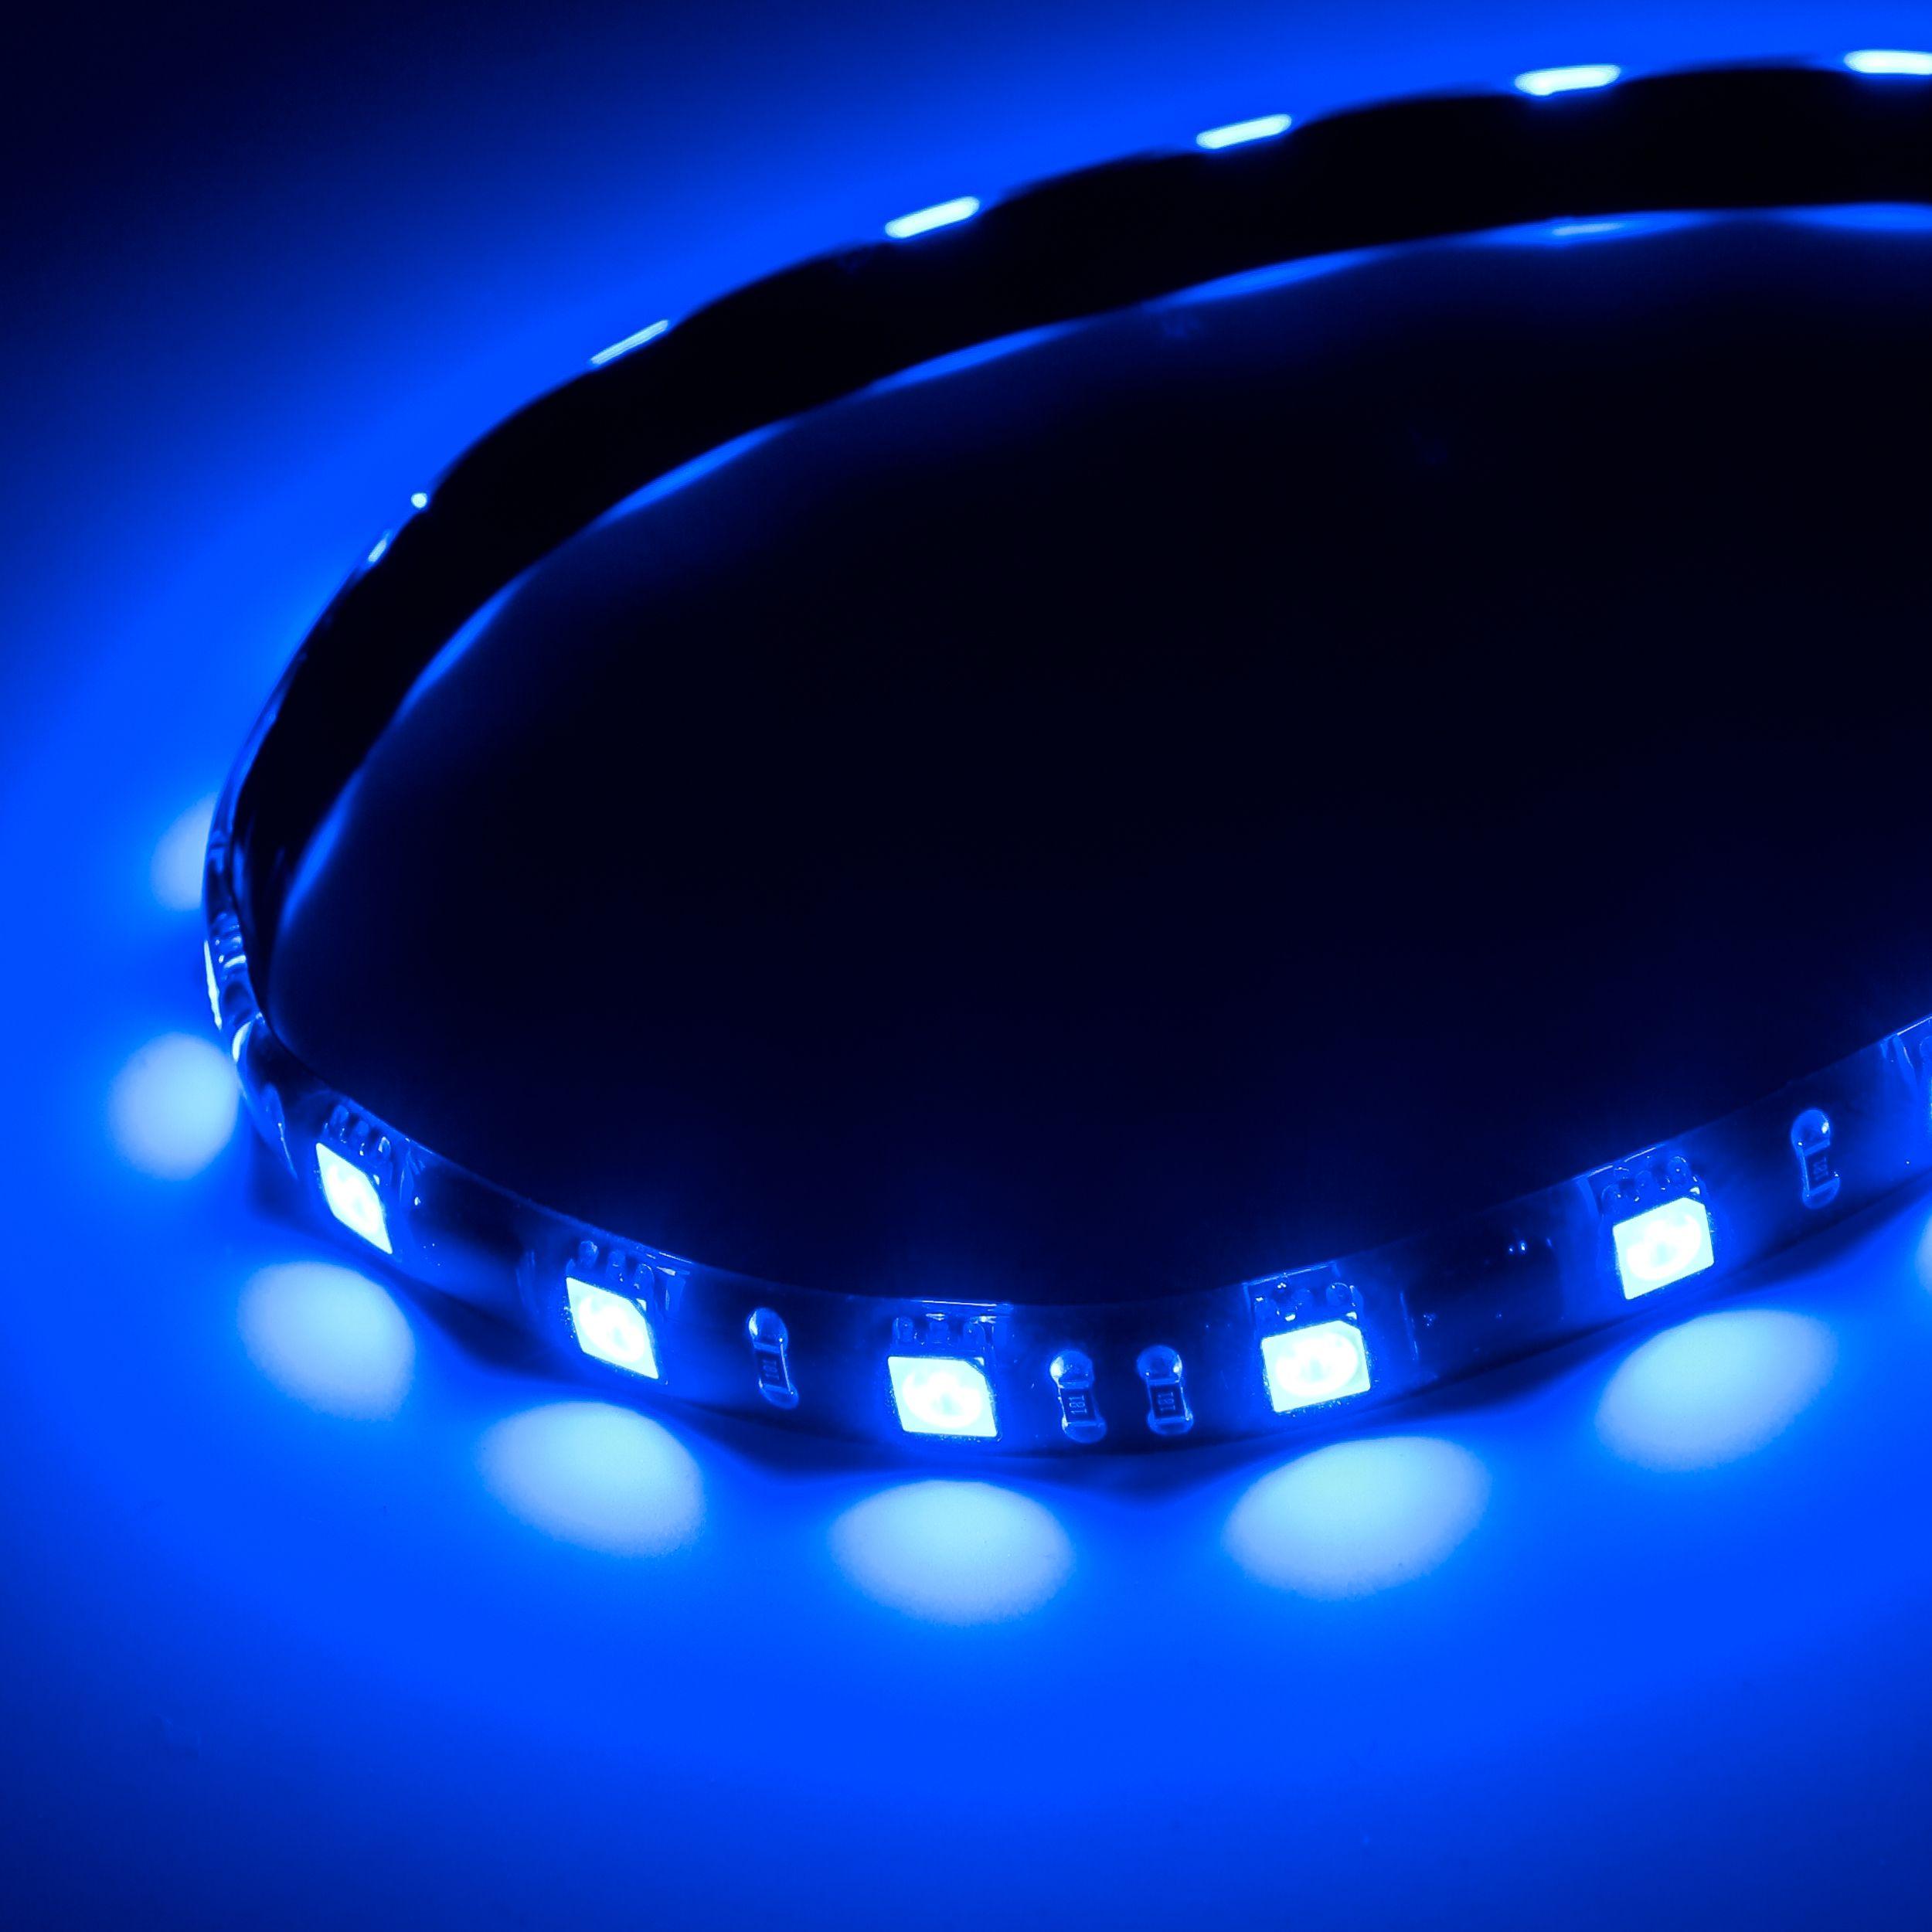 BITFENIX ALCHEMY 2.0 MAGNETIC CONNECT 15 LED-STRIP 30CM - BLUE